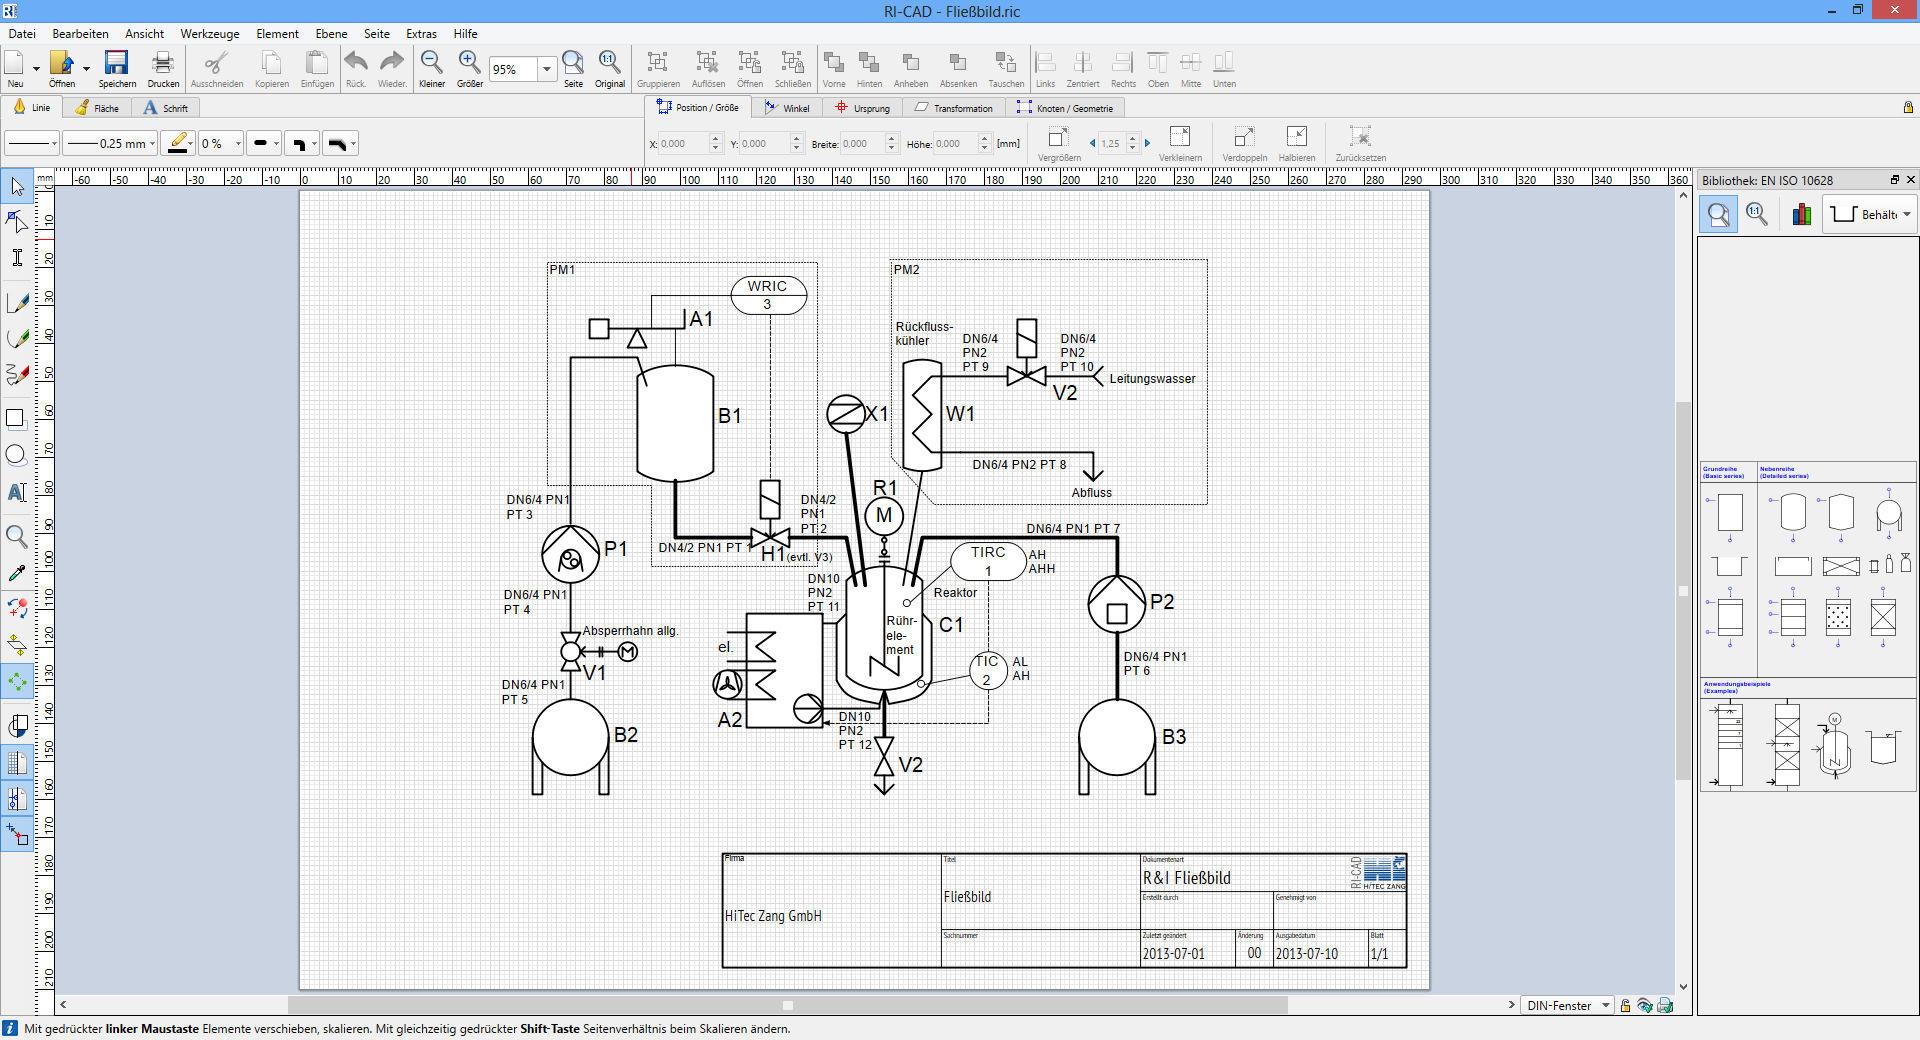 Document management software / planning - RI-CAD™ - HiTec Zang GmbH